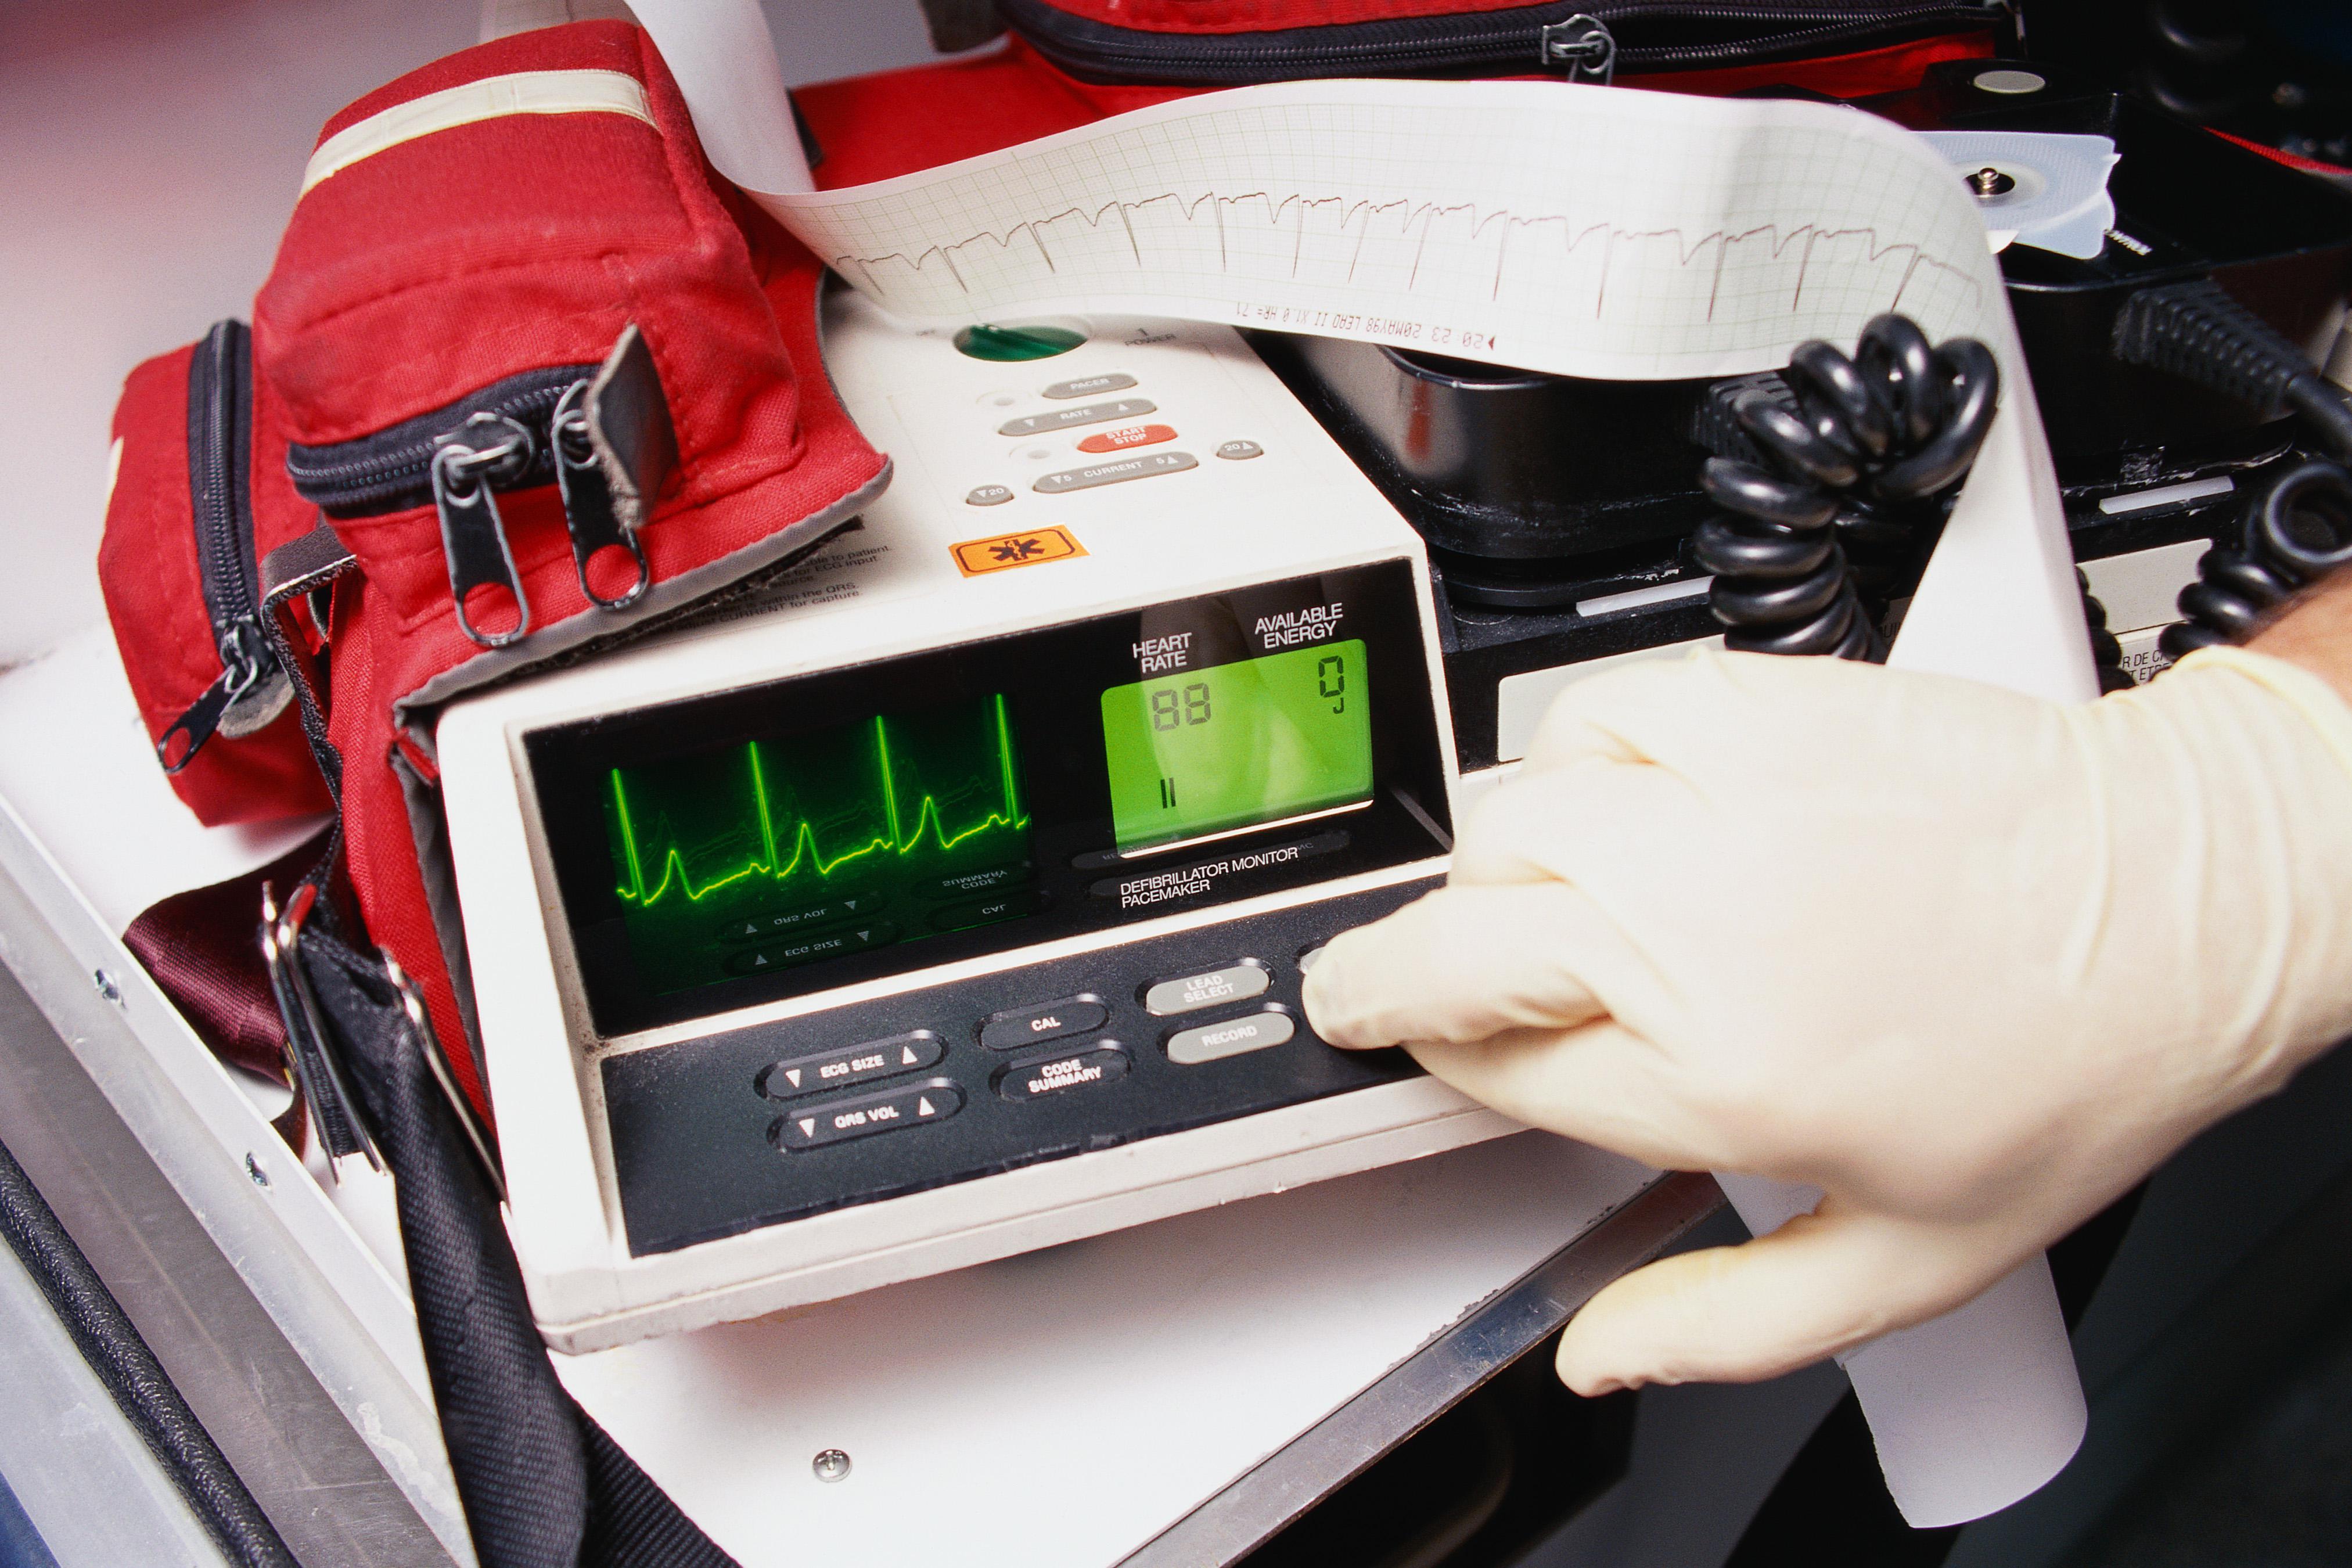 Hand in rubber glove pressing button on defibrillation monitor